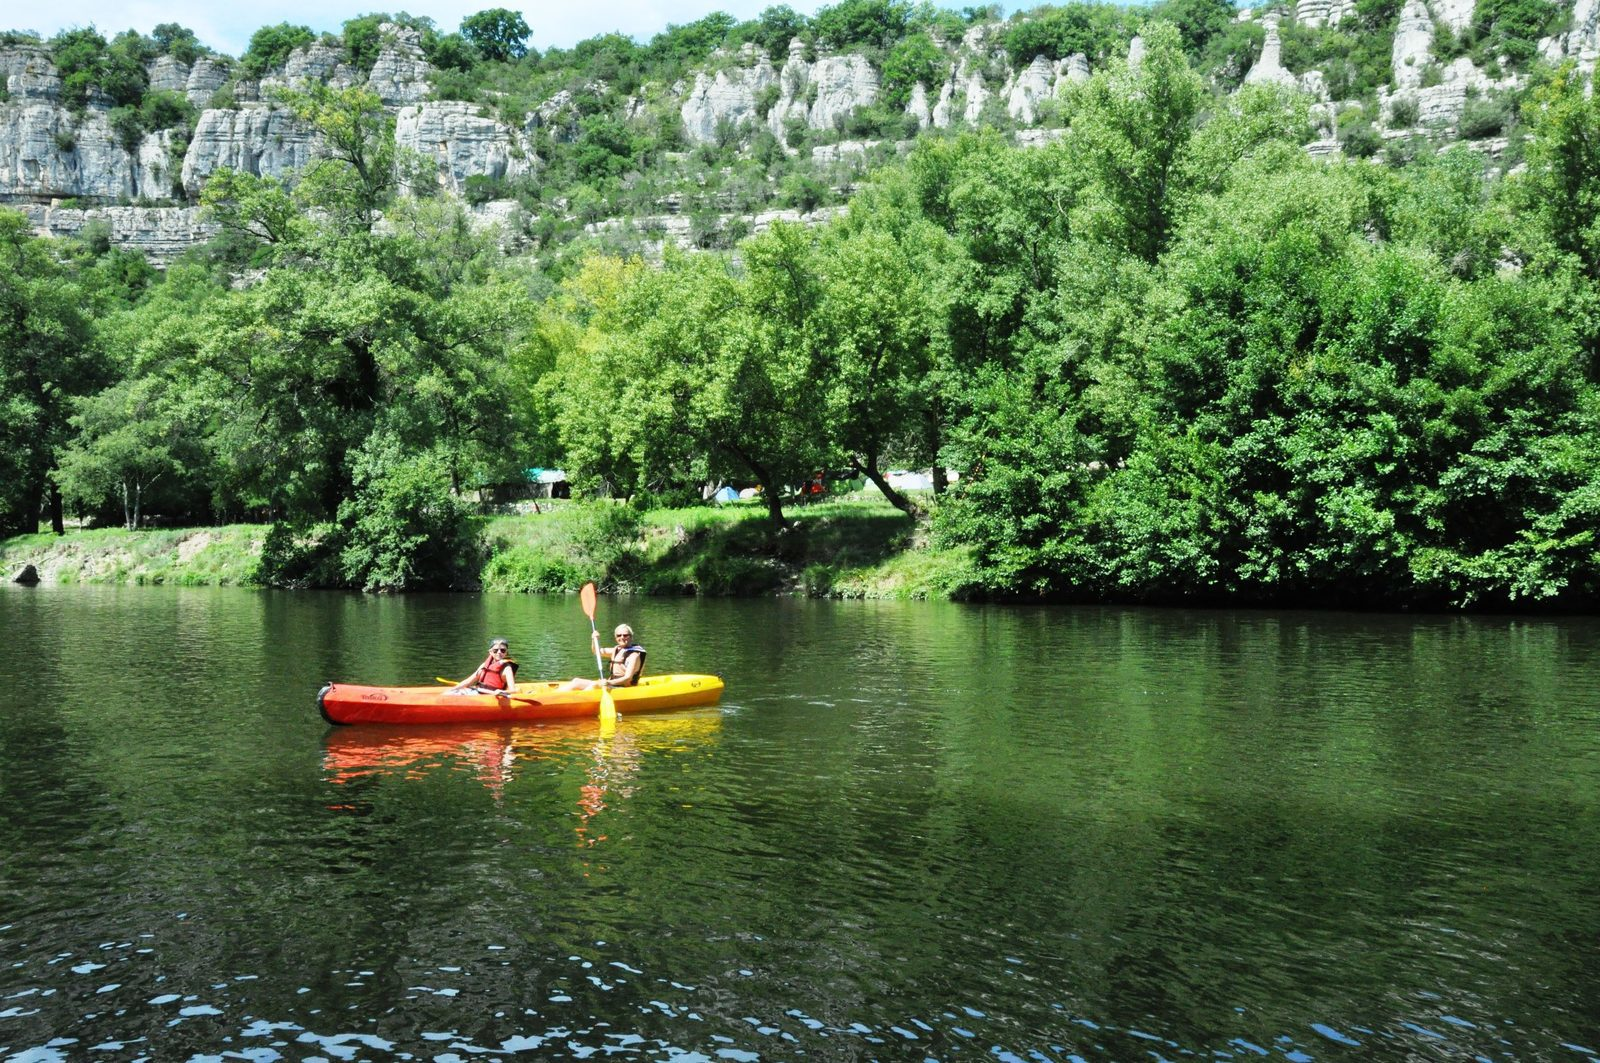 Vakantie, Ardeche, natuur, kanovaren, Gorges de l'Ardeche, Pont du Gard